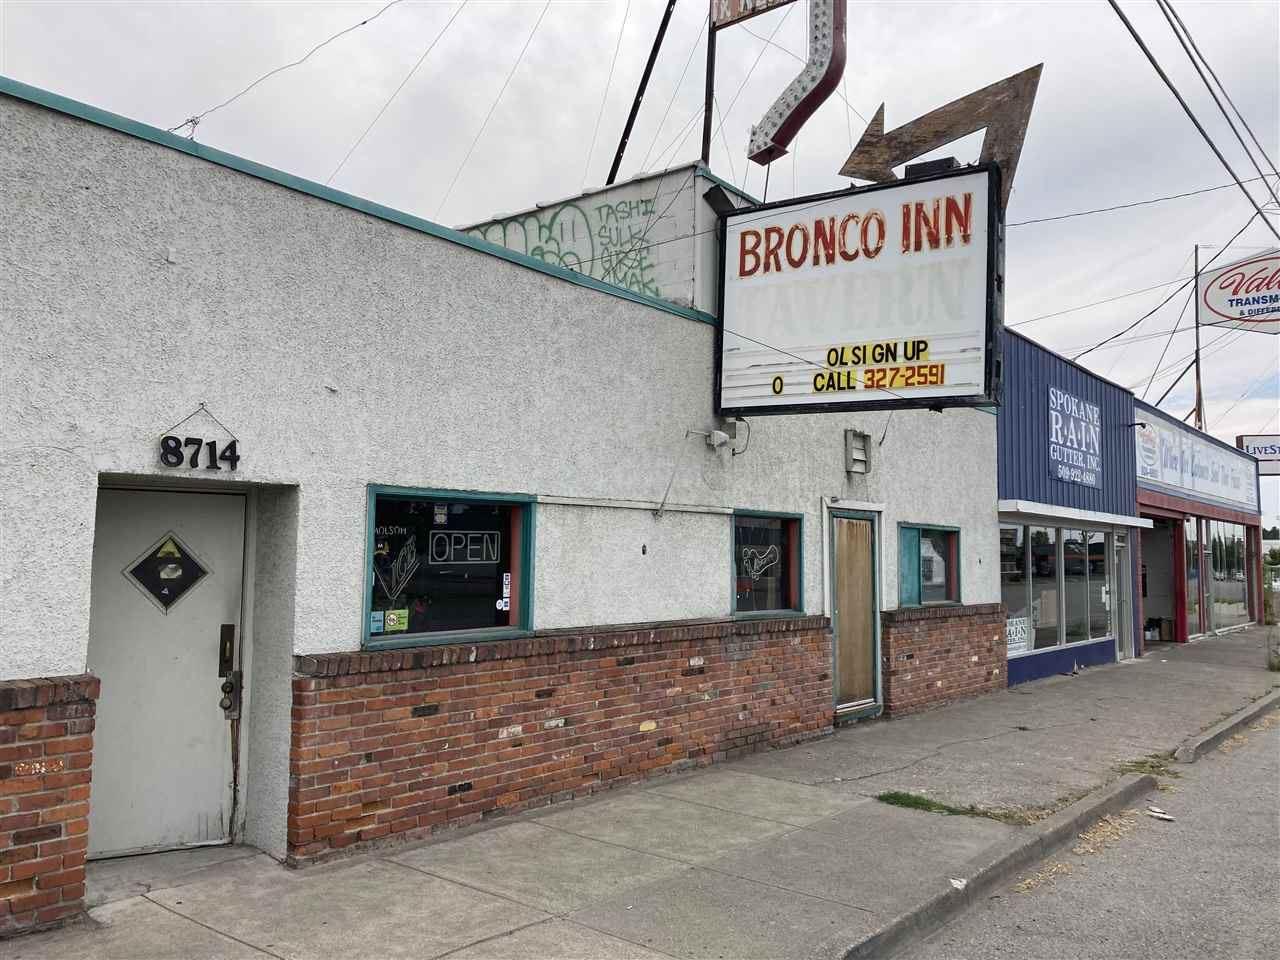 8712 E Sprague Ave, Spokane Valley, WA 99212 - #: 202020464